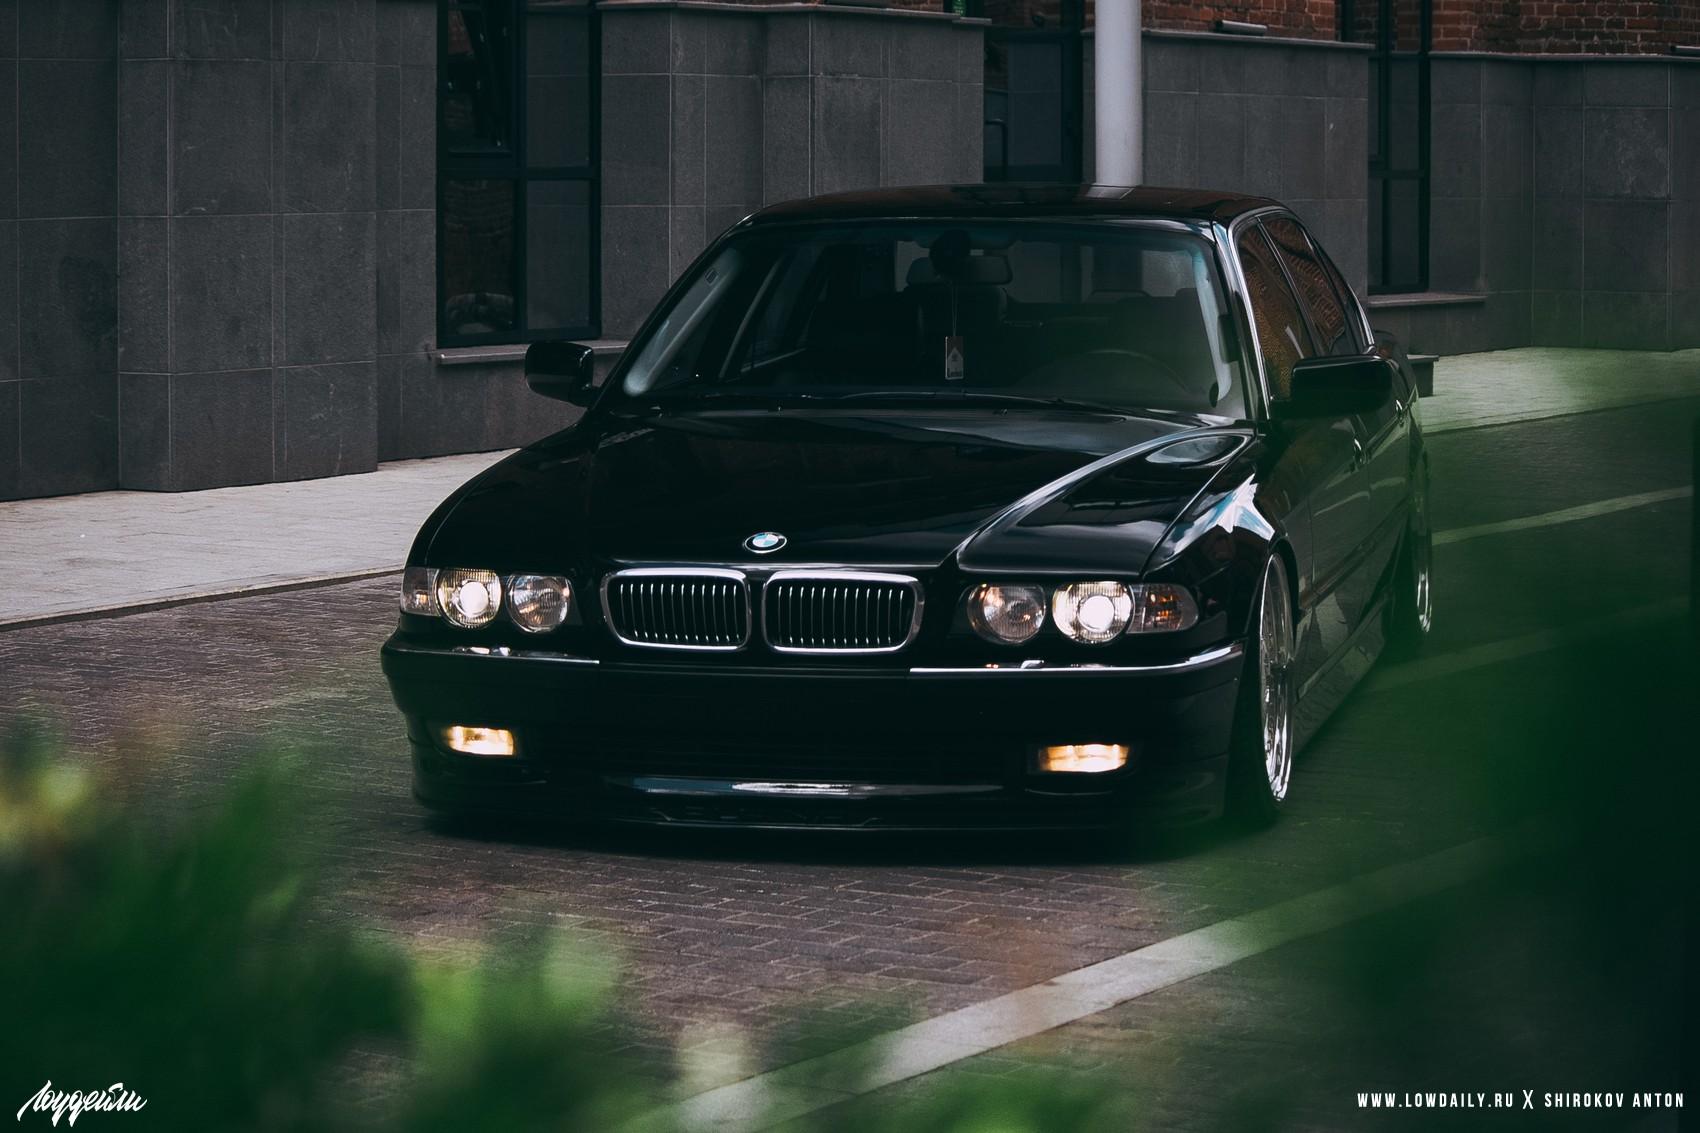 BMW E38 Lowdaily _MG_7073